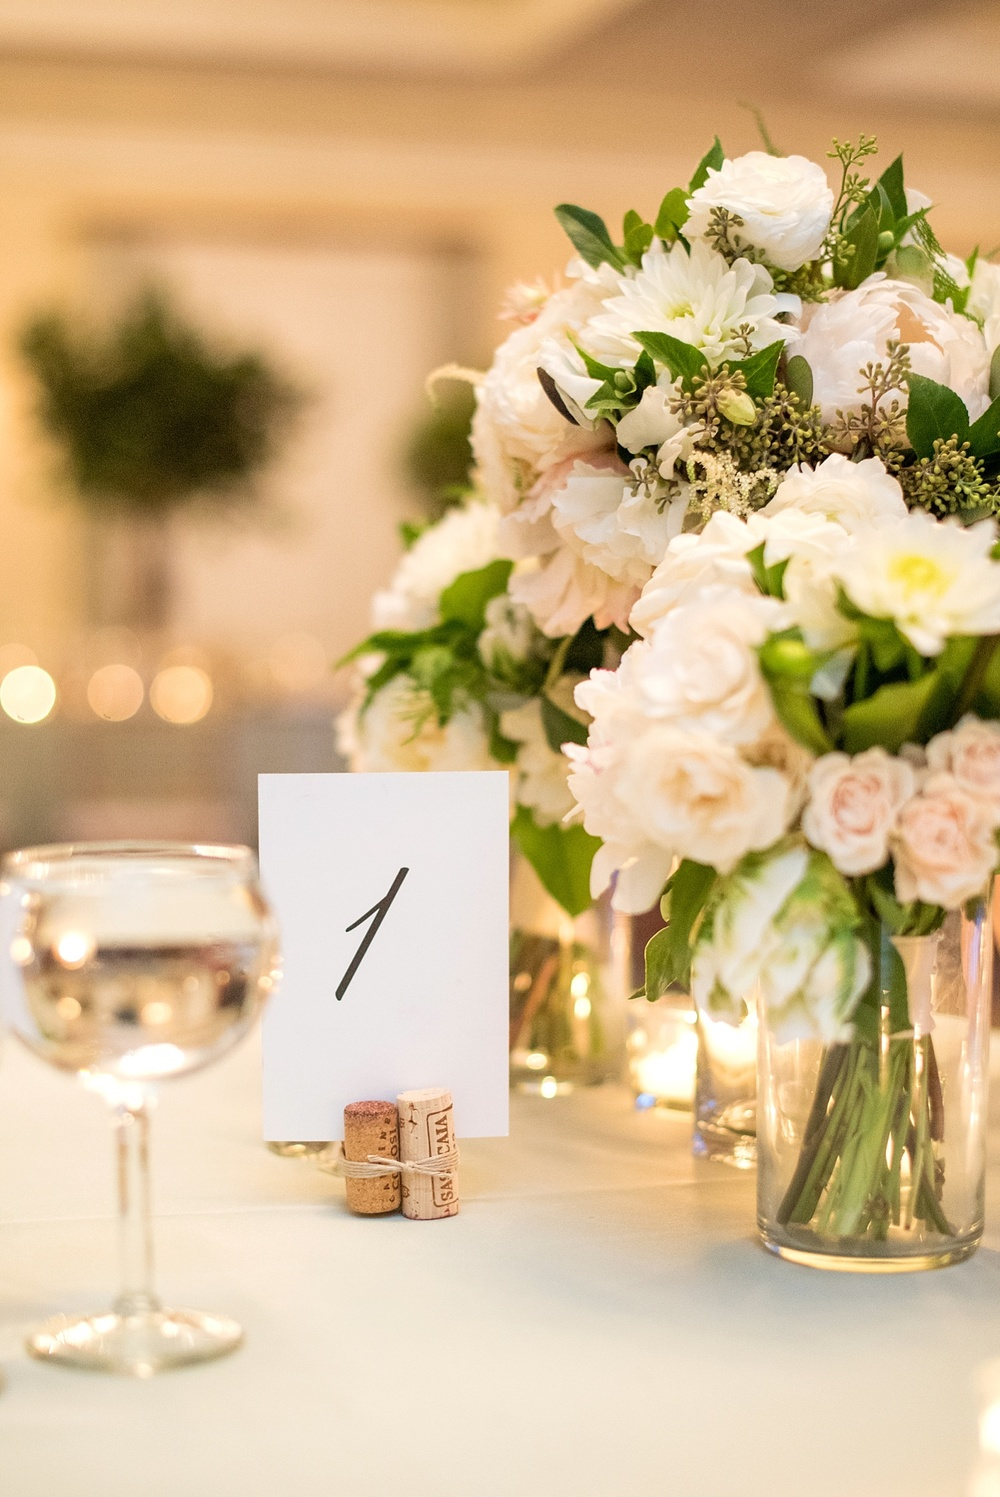 mikkelpaige-full_aperture_floral-pearl_river_hilton_wedding_0030.jpg